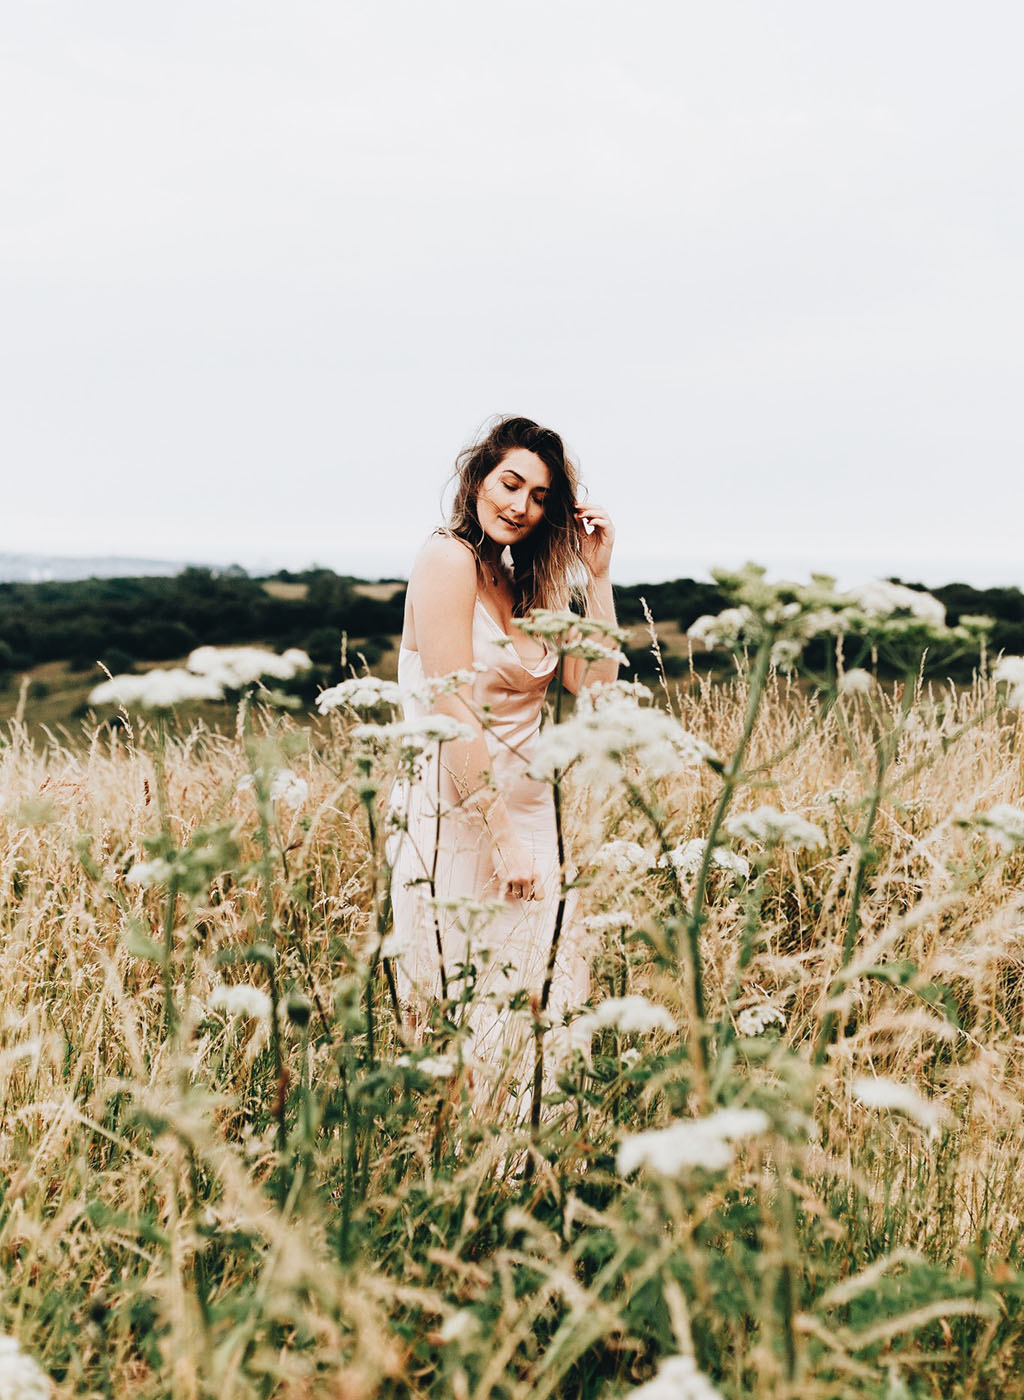 lareese craig brighton blogger zara camisole dress